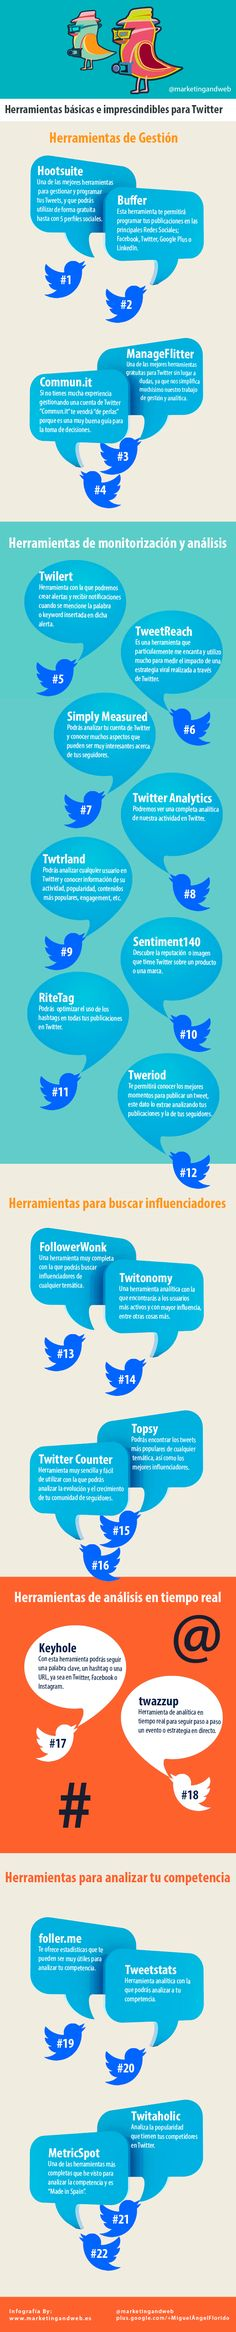 herramientas-basicas-imprescindibles-para-twitter-infografia.png (640×6326)